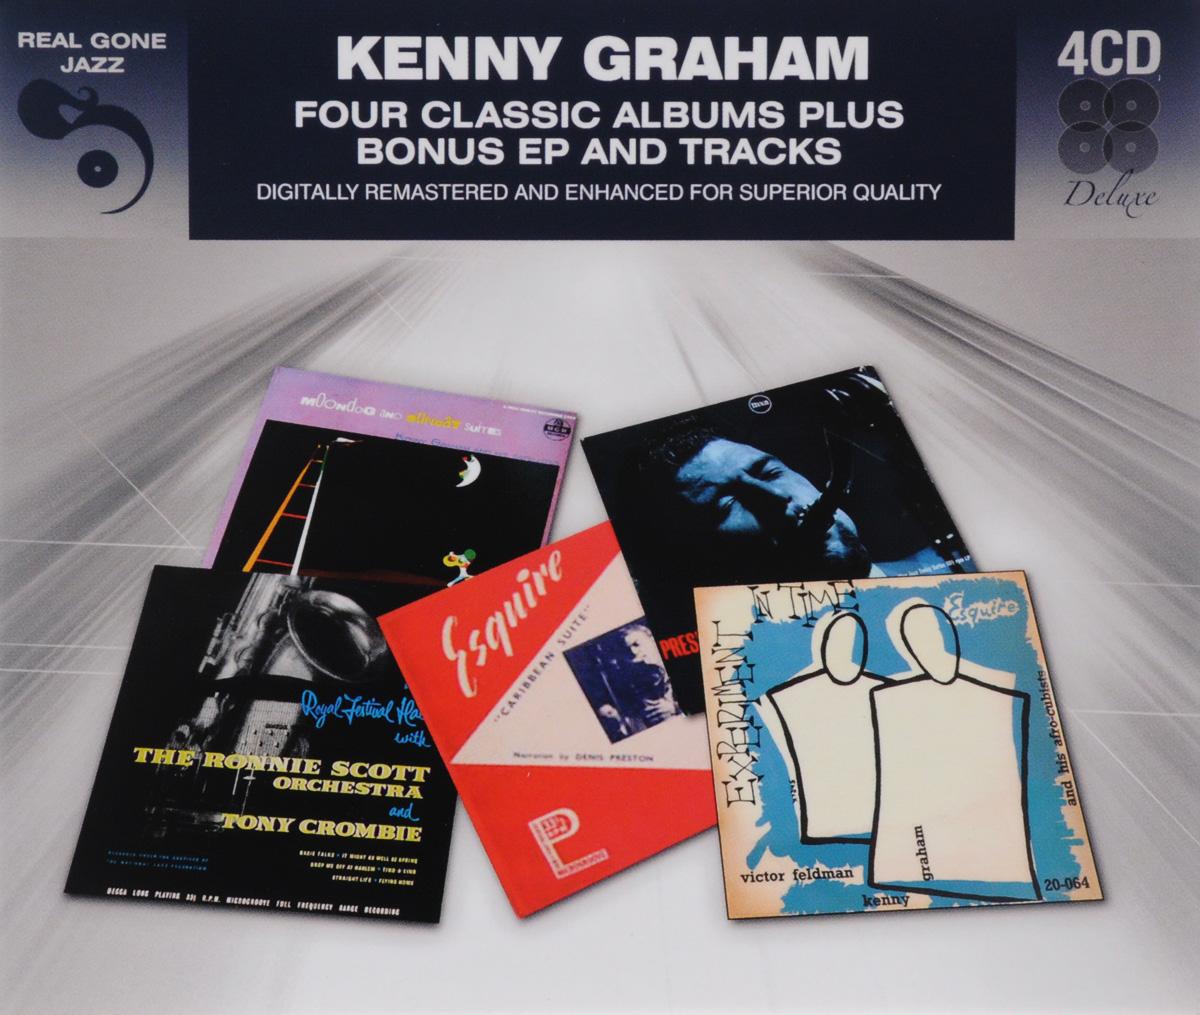 Грэм Кенни Kenny Graham. 4 Classic Albums Plus Bonus EP And Tracks (4 CD) diana mugano 7 ways to retire wealthy plus bonus senior citizen jokes